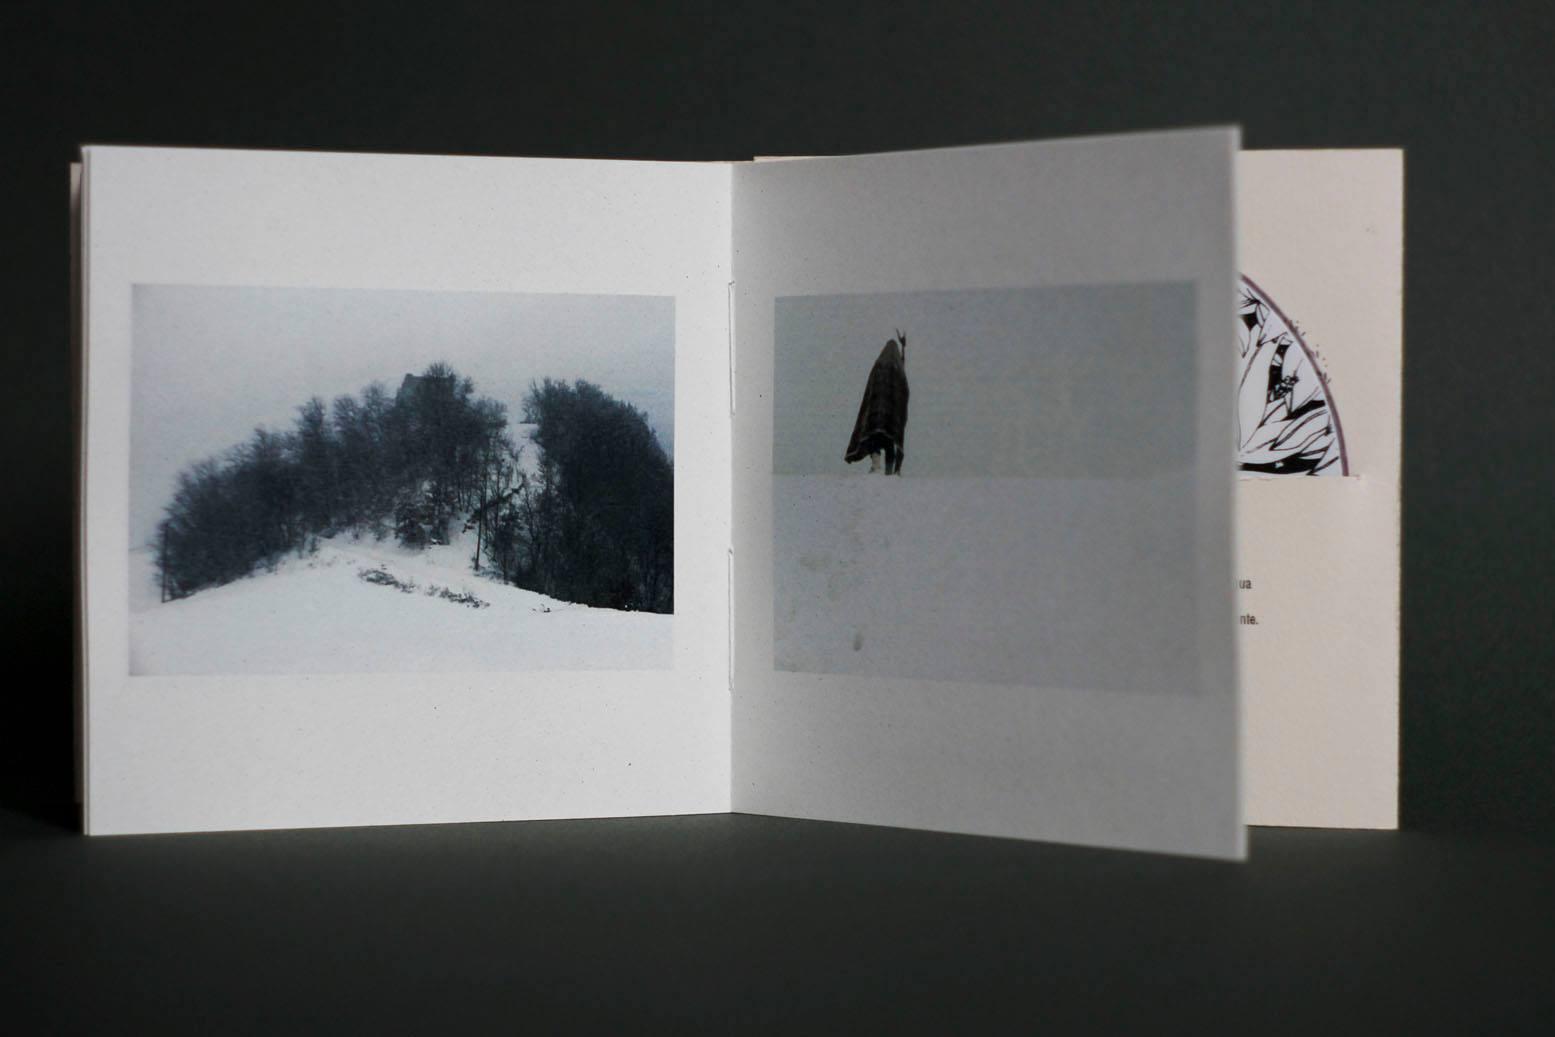 supra-natura-booklet-dvd-by-perpetua-edizioni-05